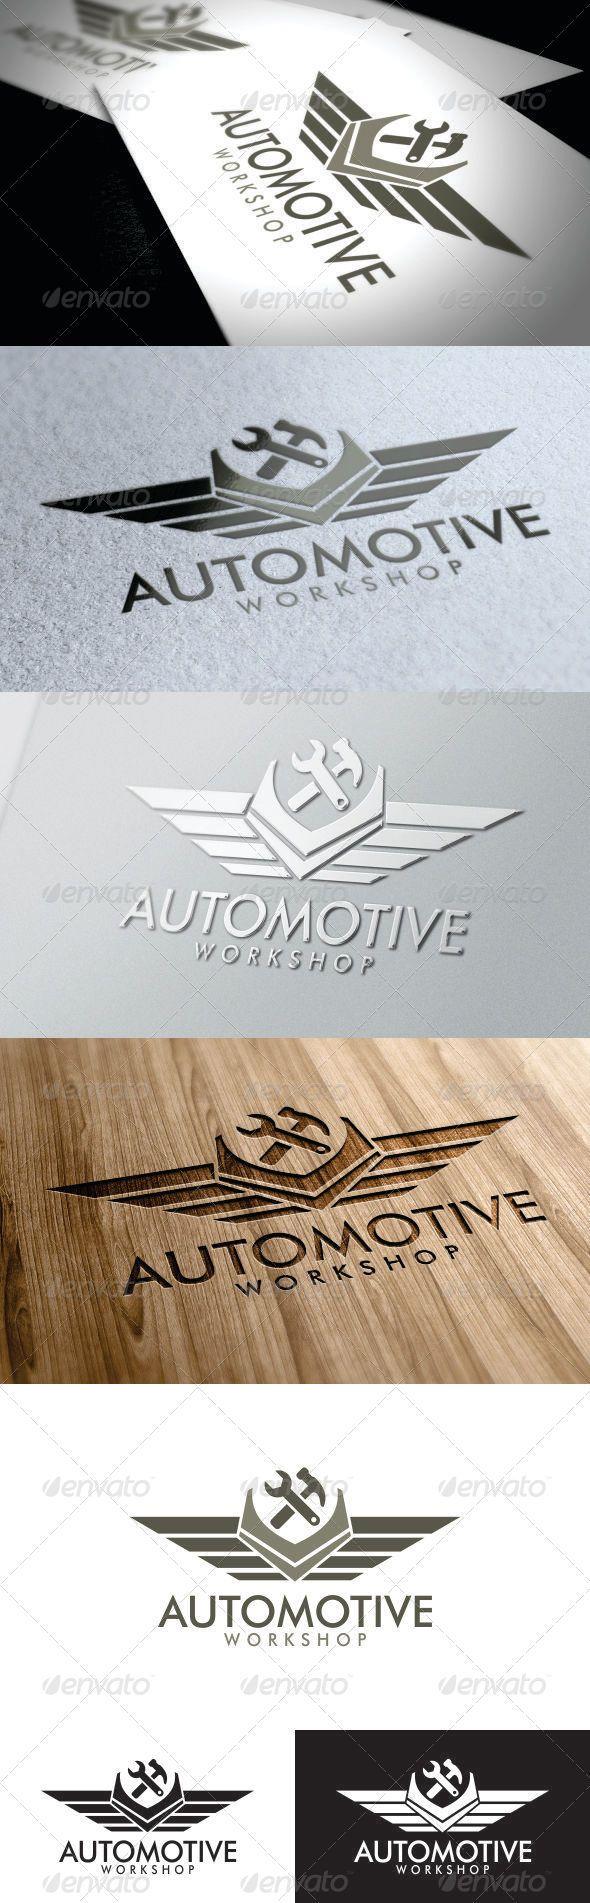 Automotive Workshop Logo  #GraphicRiver